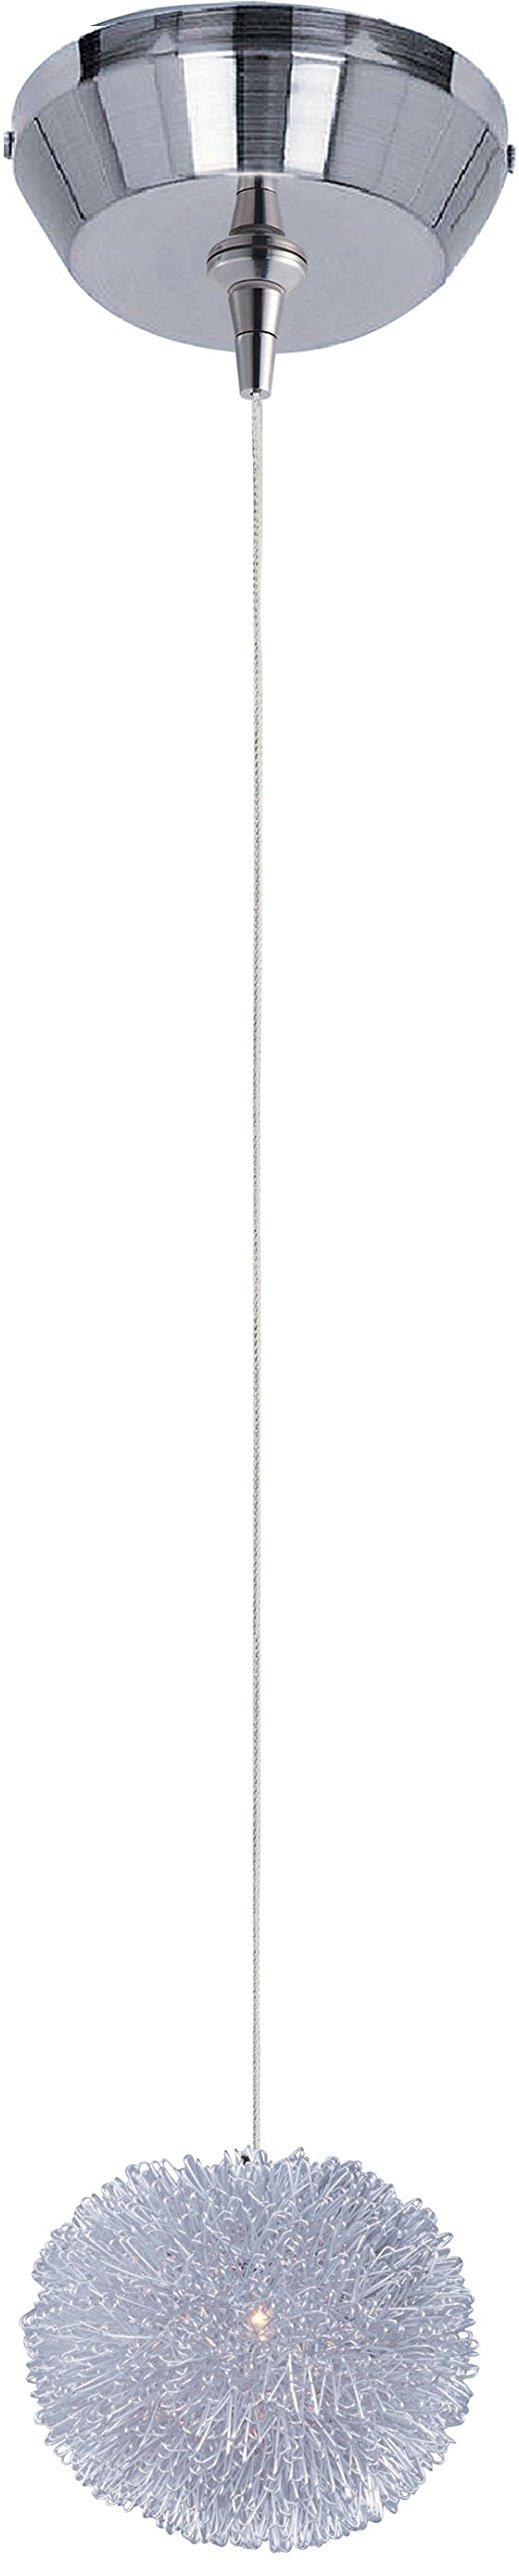 ET2 Lighting 94320 Clipp Mini Pendant Fixture, Brushed Aluminum Finish, 5 by 8.15-Inch